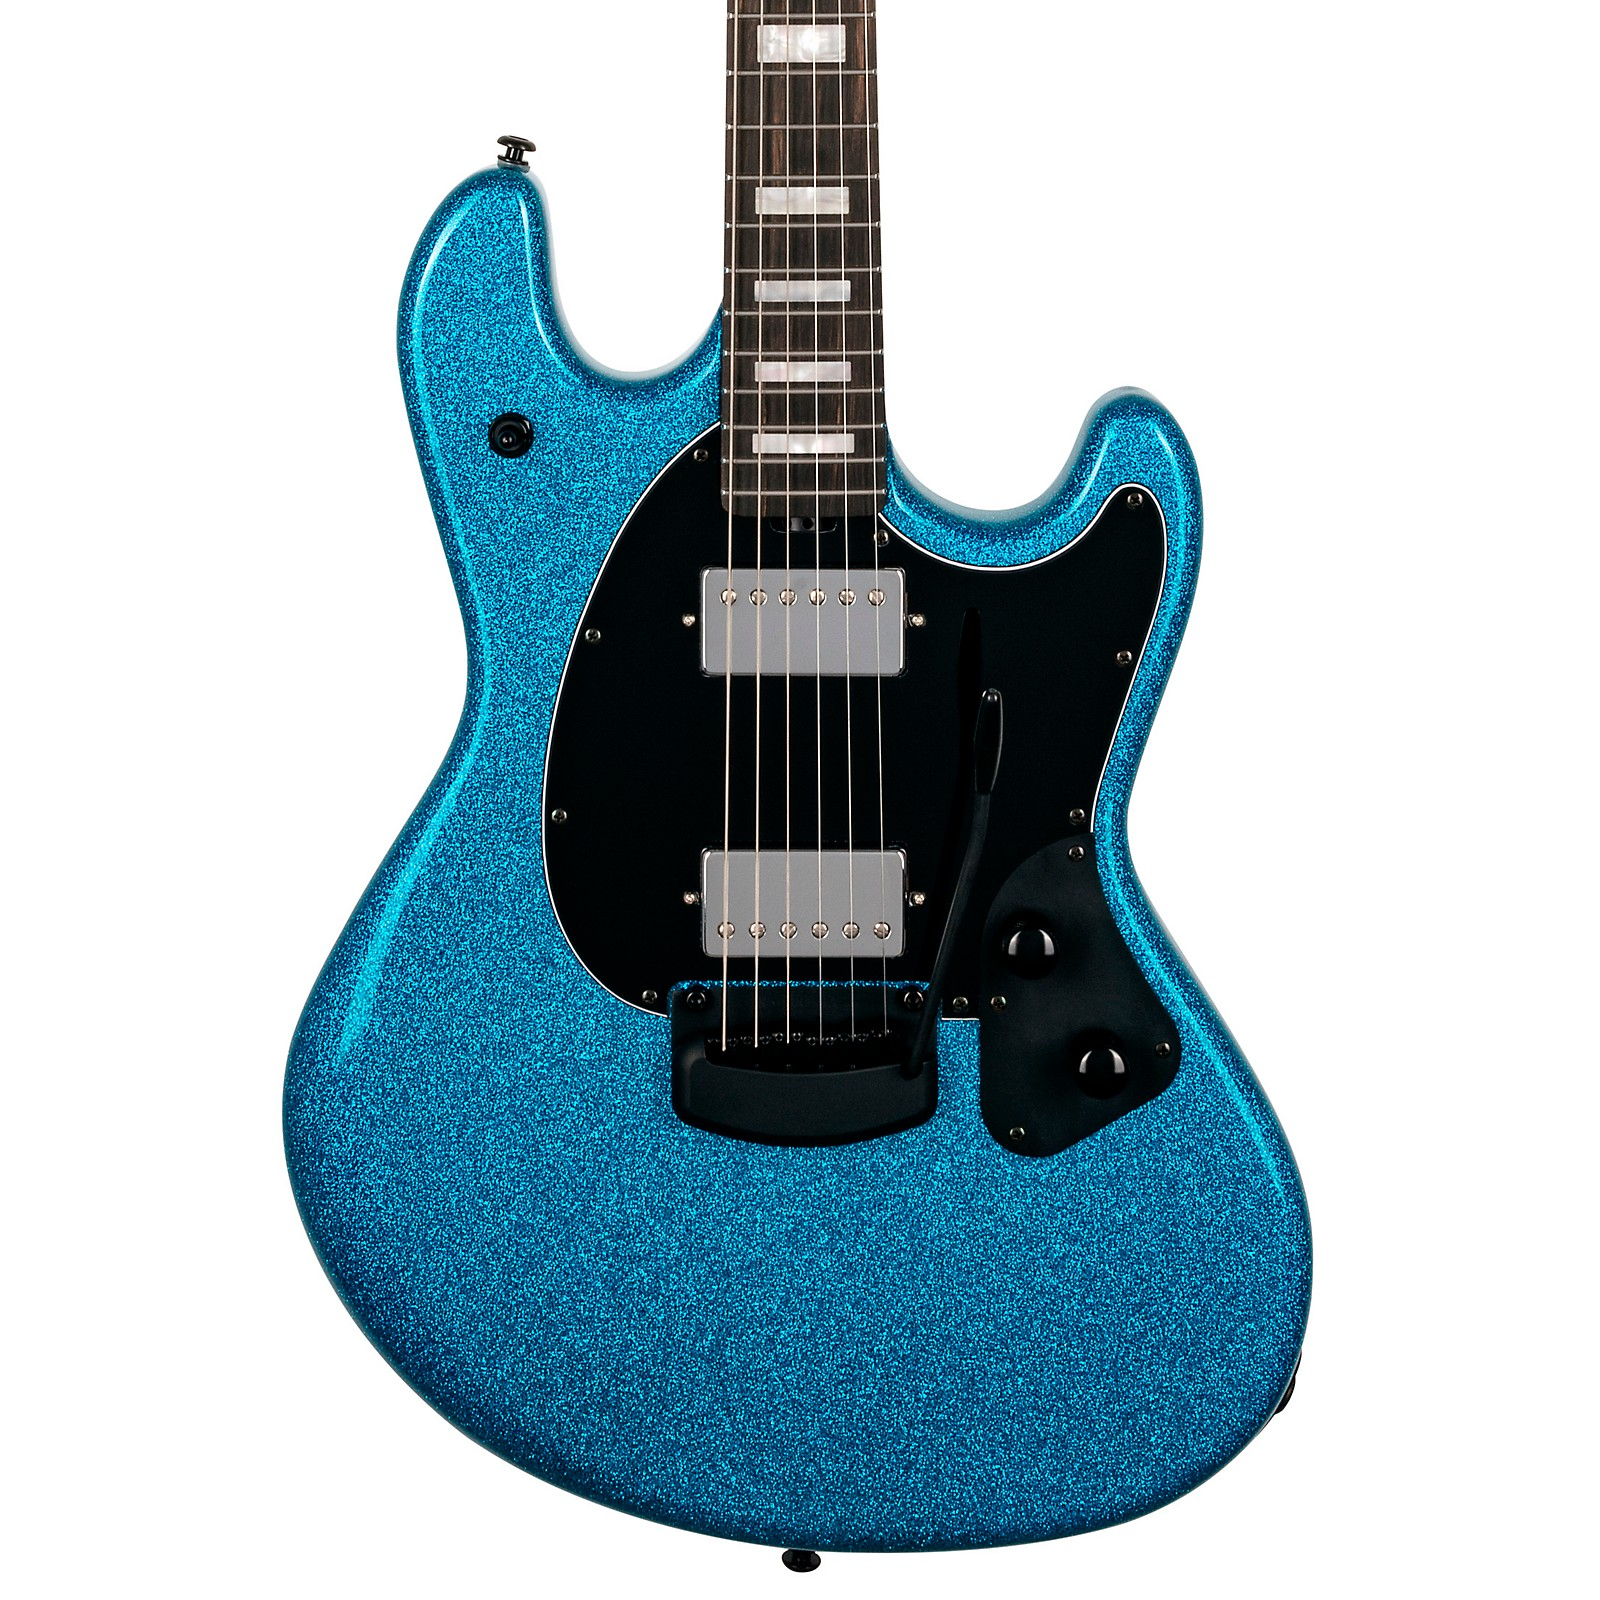 Ernie Ball Music Man Stingray BFR Electric Guitar